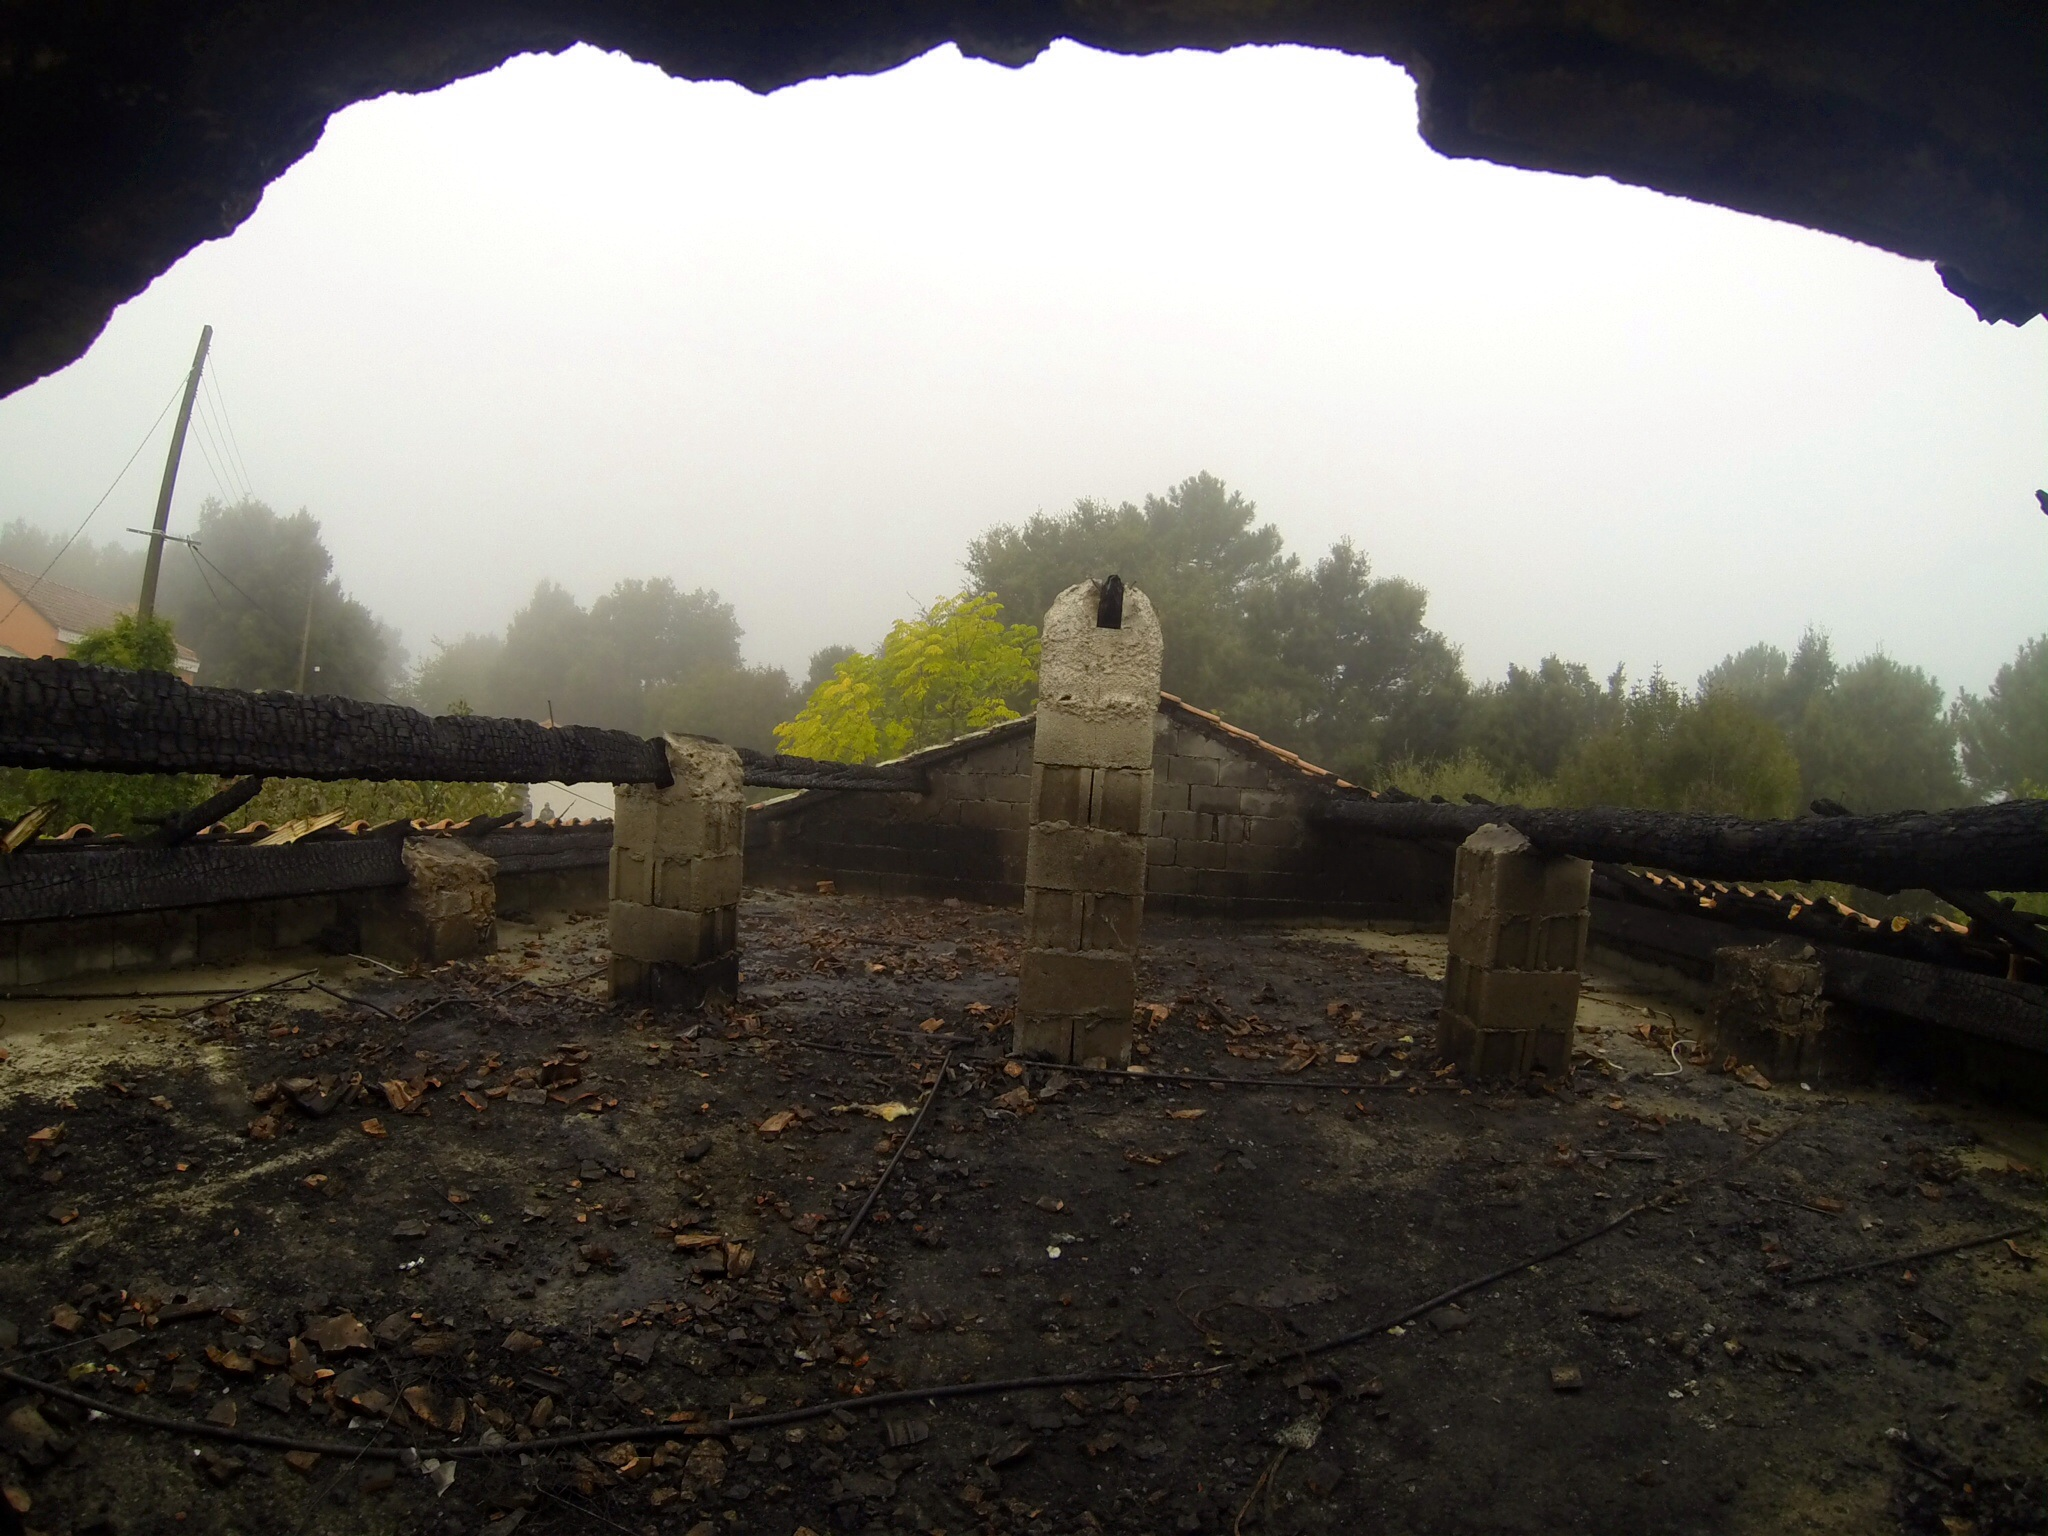 Ania di Fium'orbu : Le toit prend feu après un impact de foudre